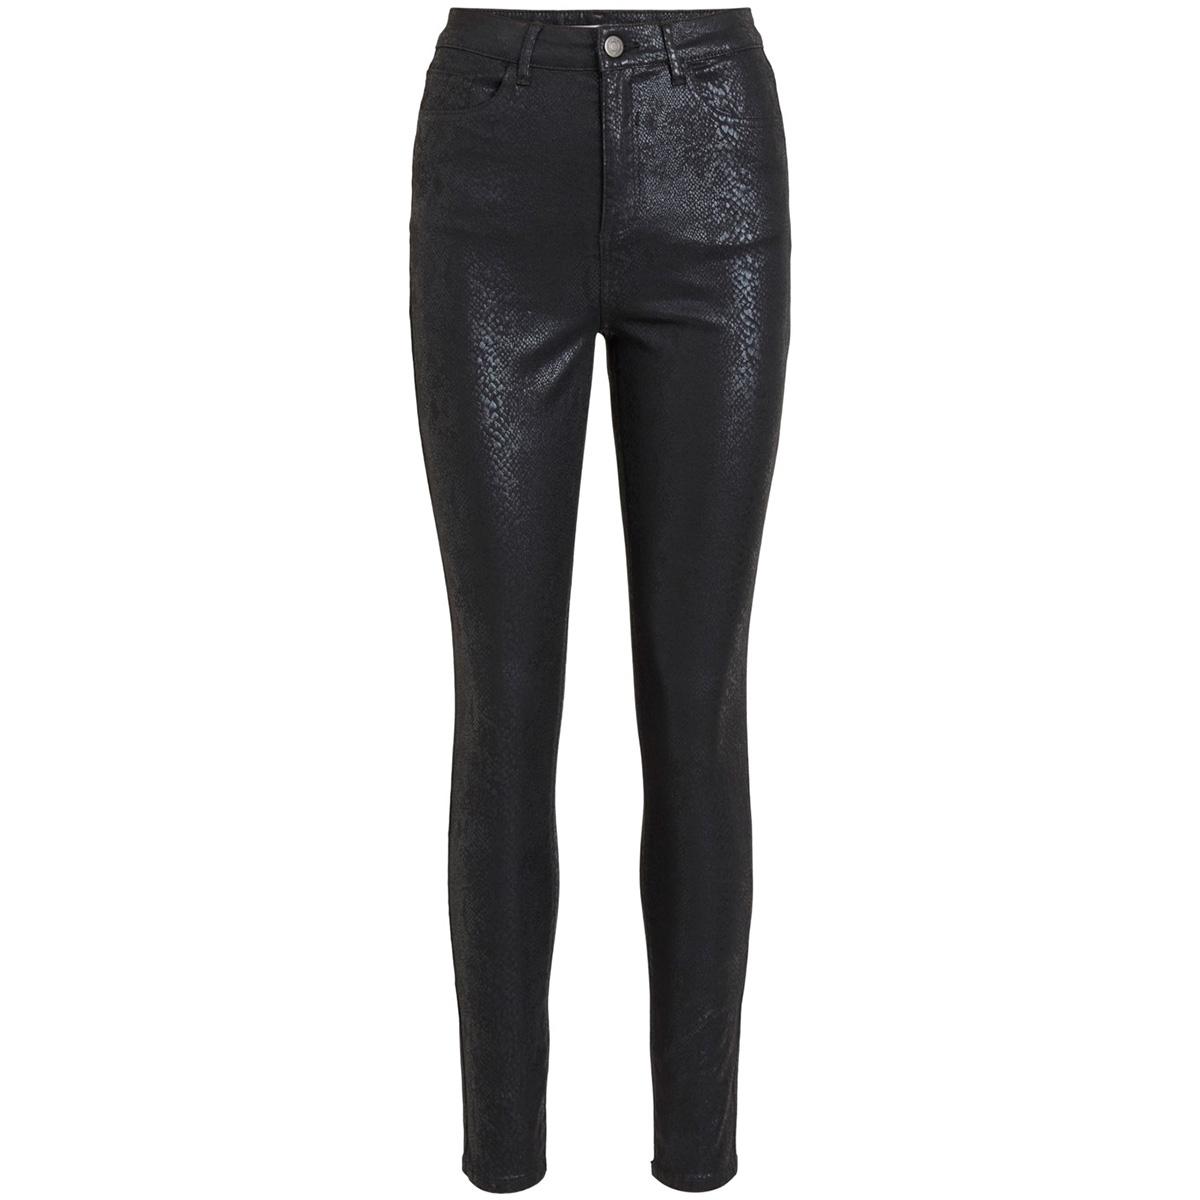 vislangsiasa hwss 5p  pants/ki 14054356 vila broek black aop